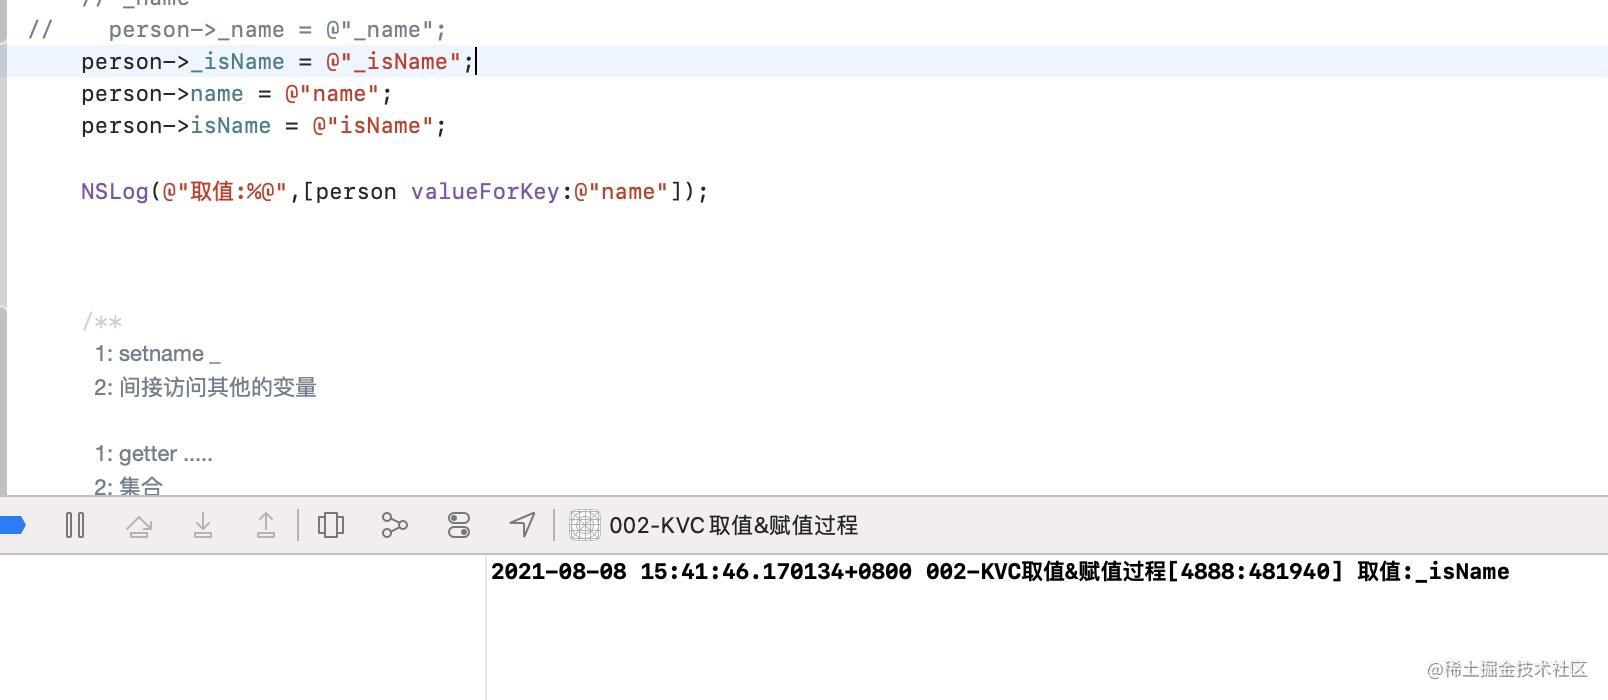 Xnip2021-08-08_15-42-40.jpg